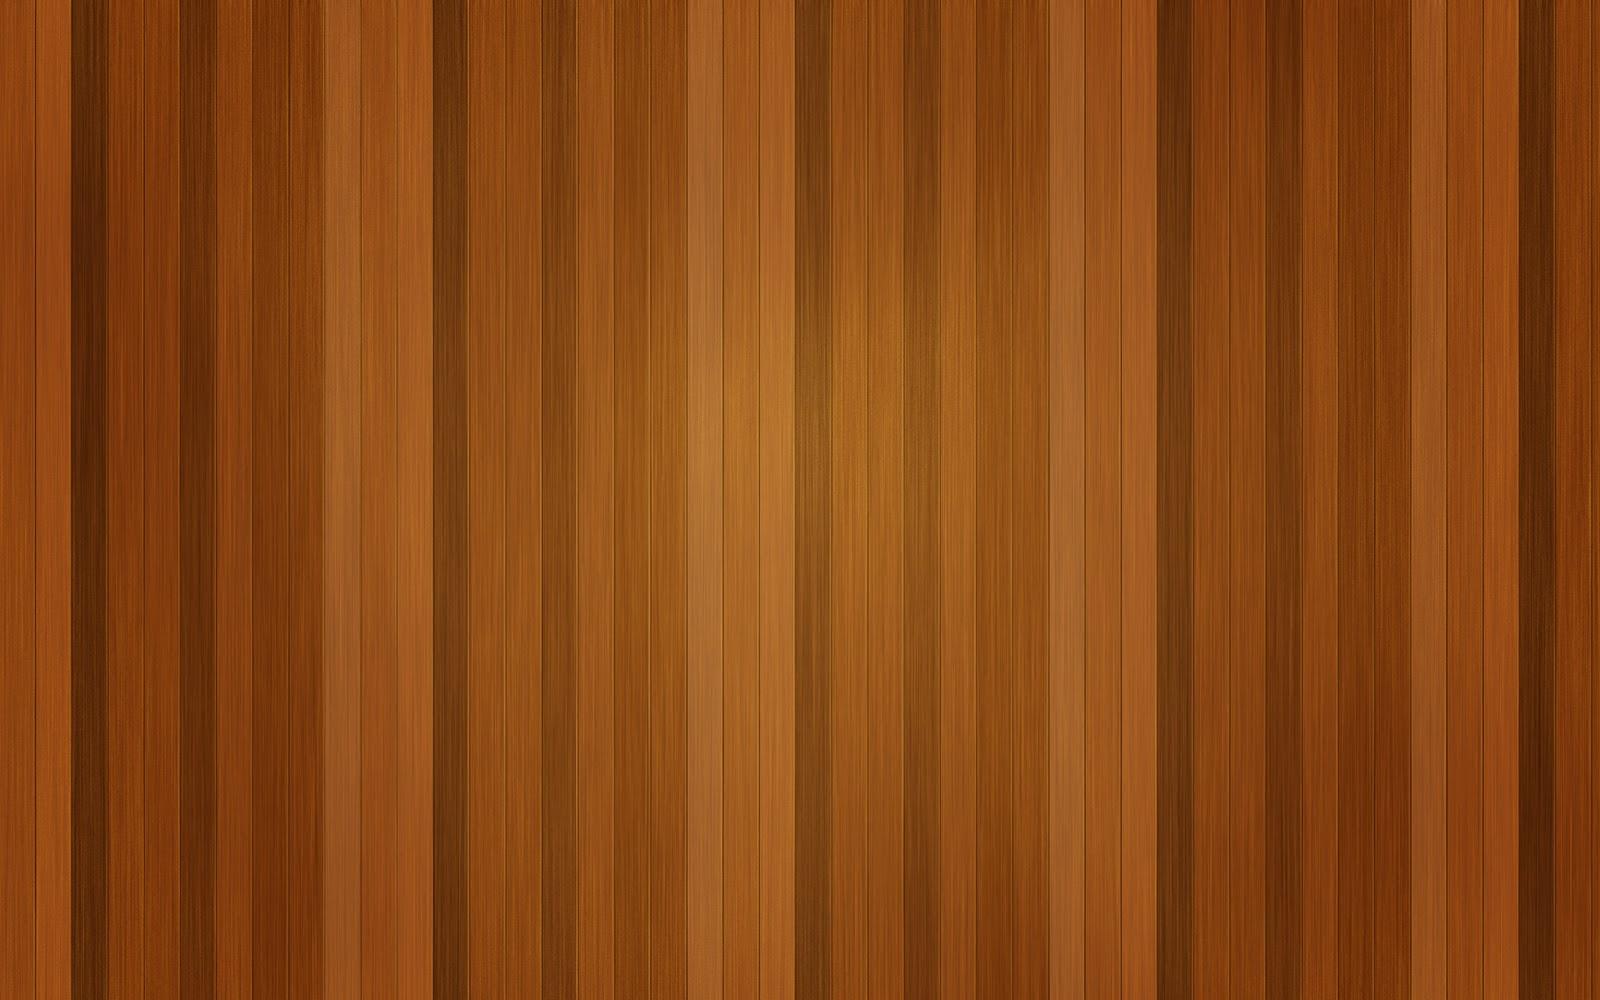 wallpaper wood 2 - photo #8